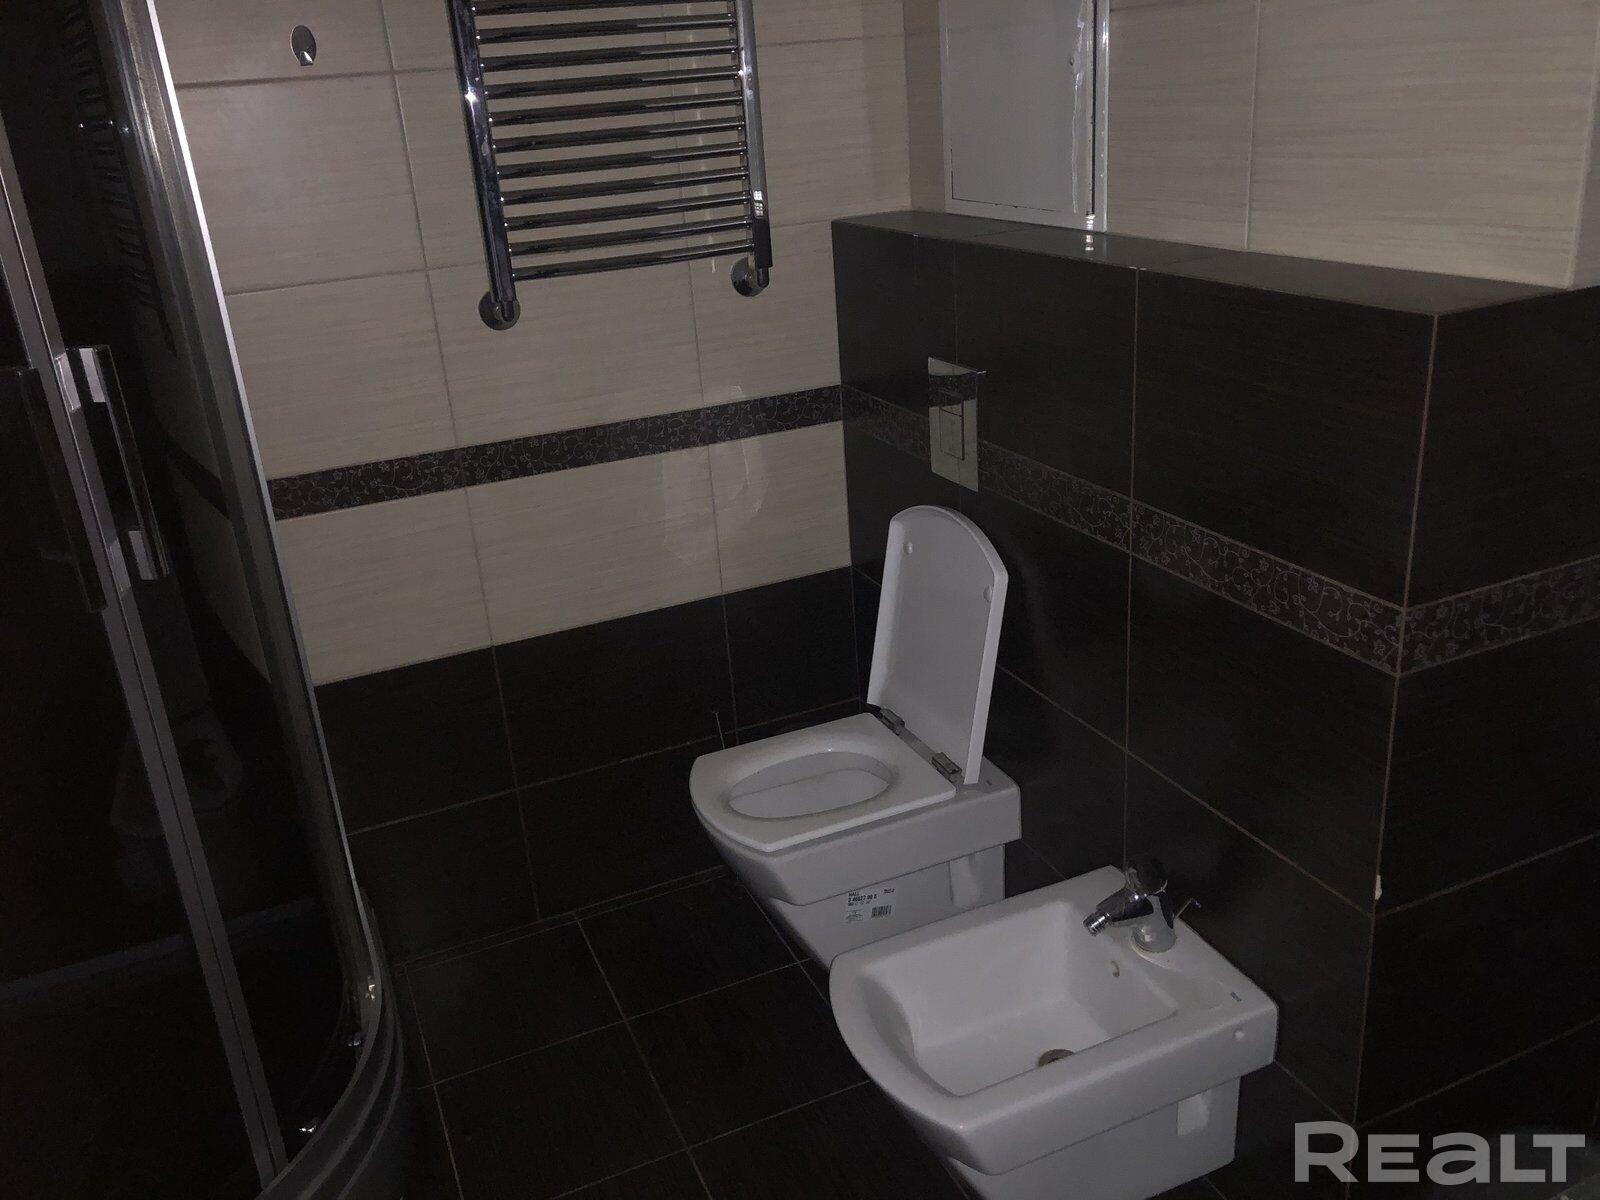 Продается 3-х комнатная квартира, ул. Беды д.2-Б - фото №12